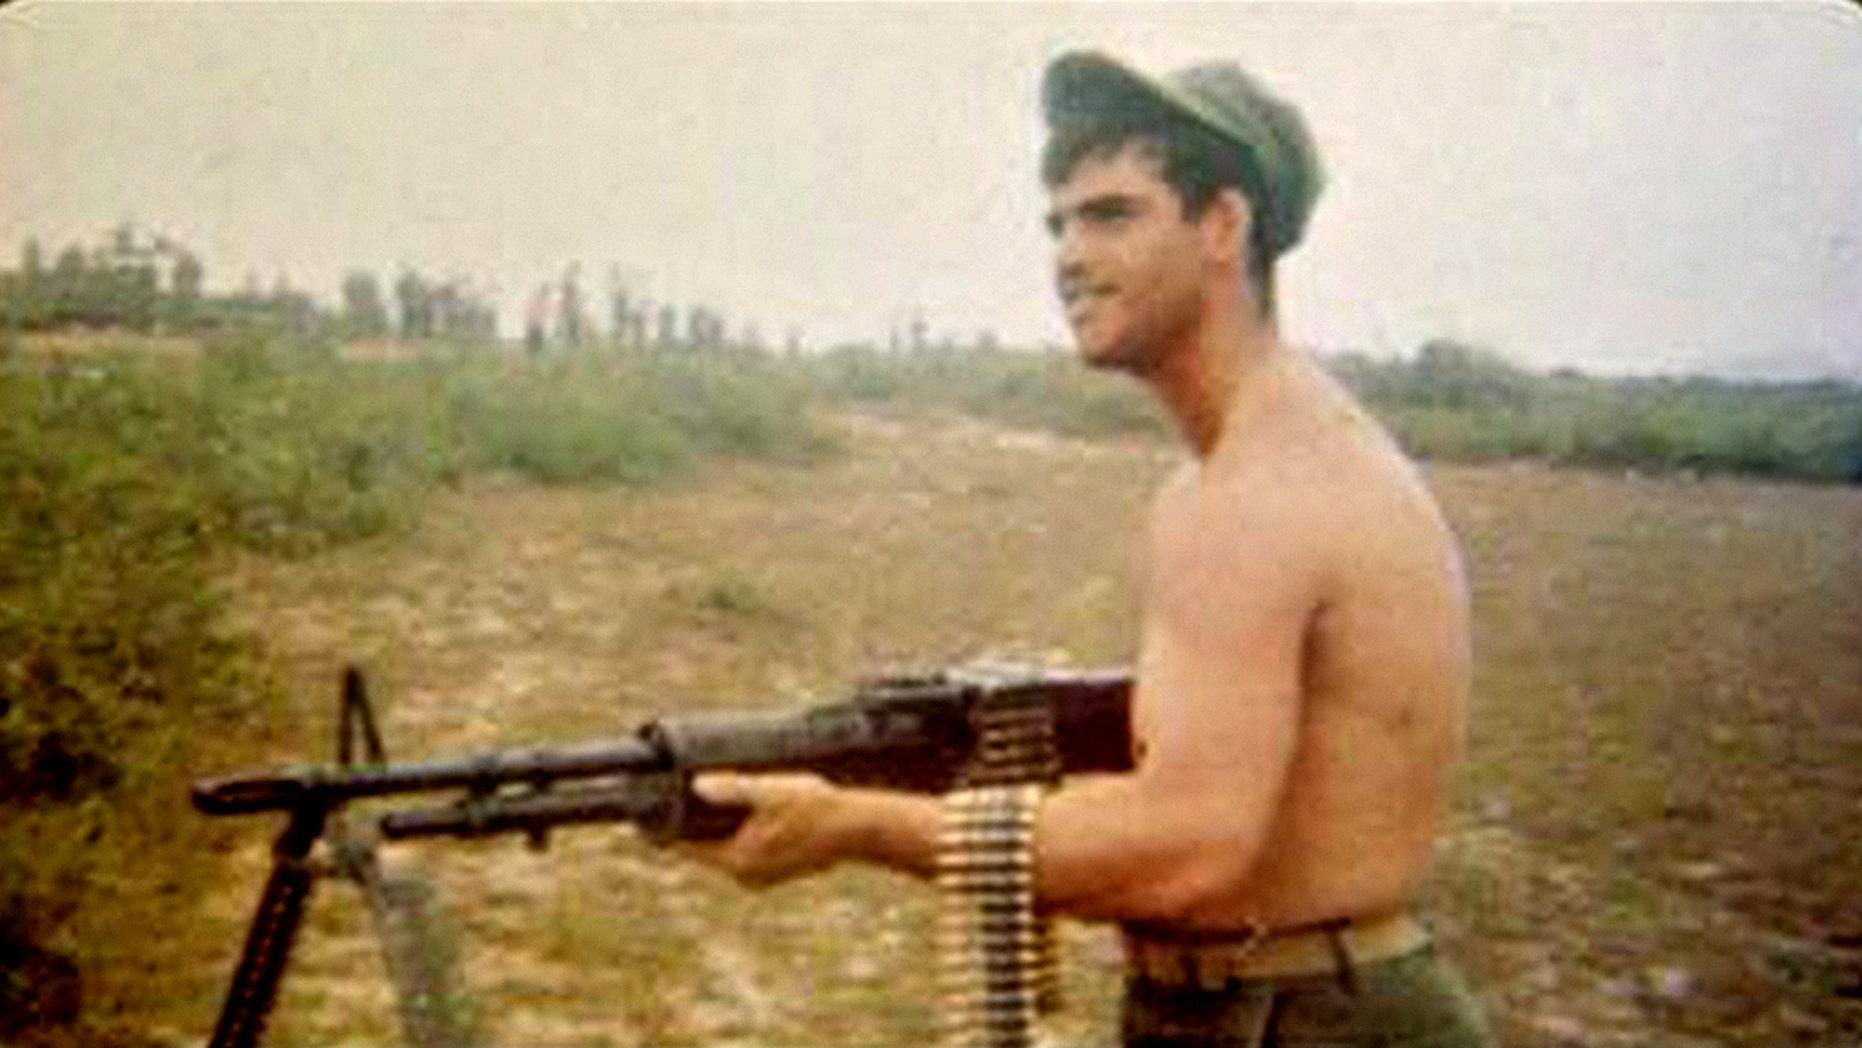 Marine Lance Corporal Jimmy Reddington was killed in Vietnam in 1967.